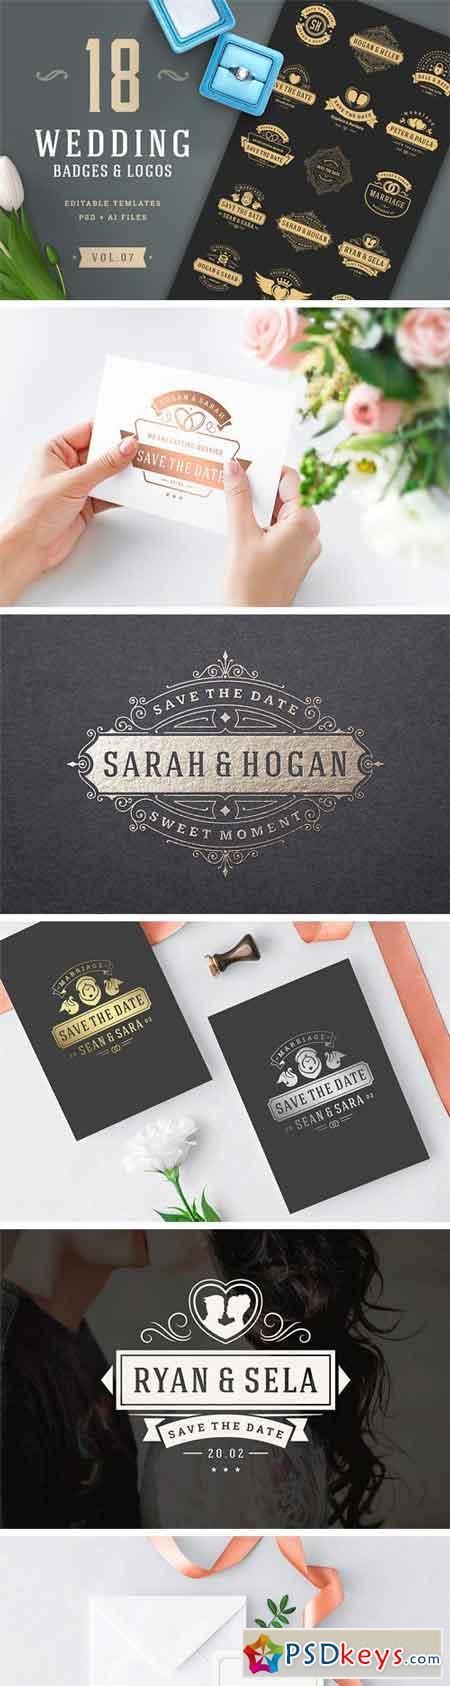 18 Wedding Logos and Badges 2202089 » Free Download